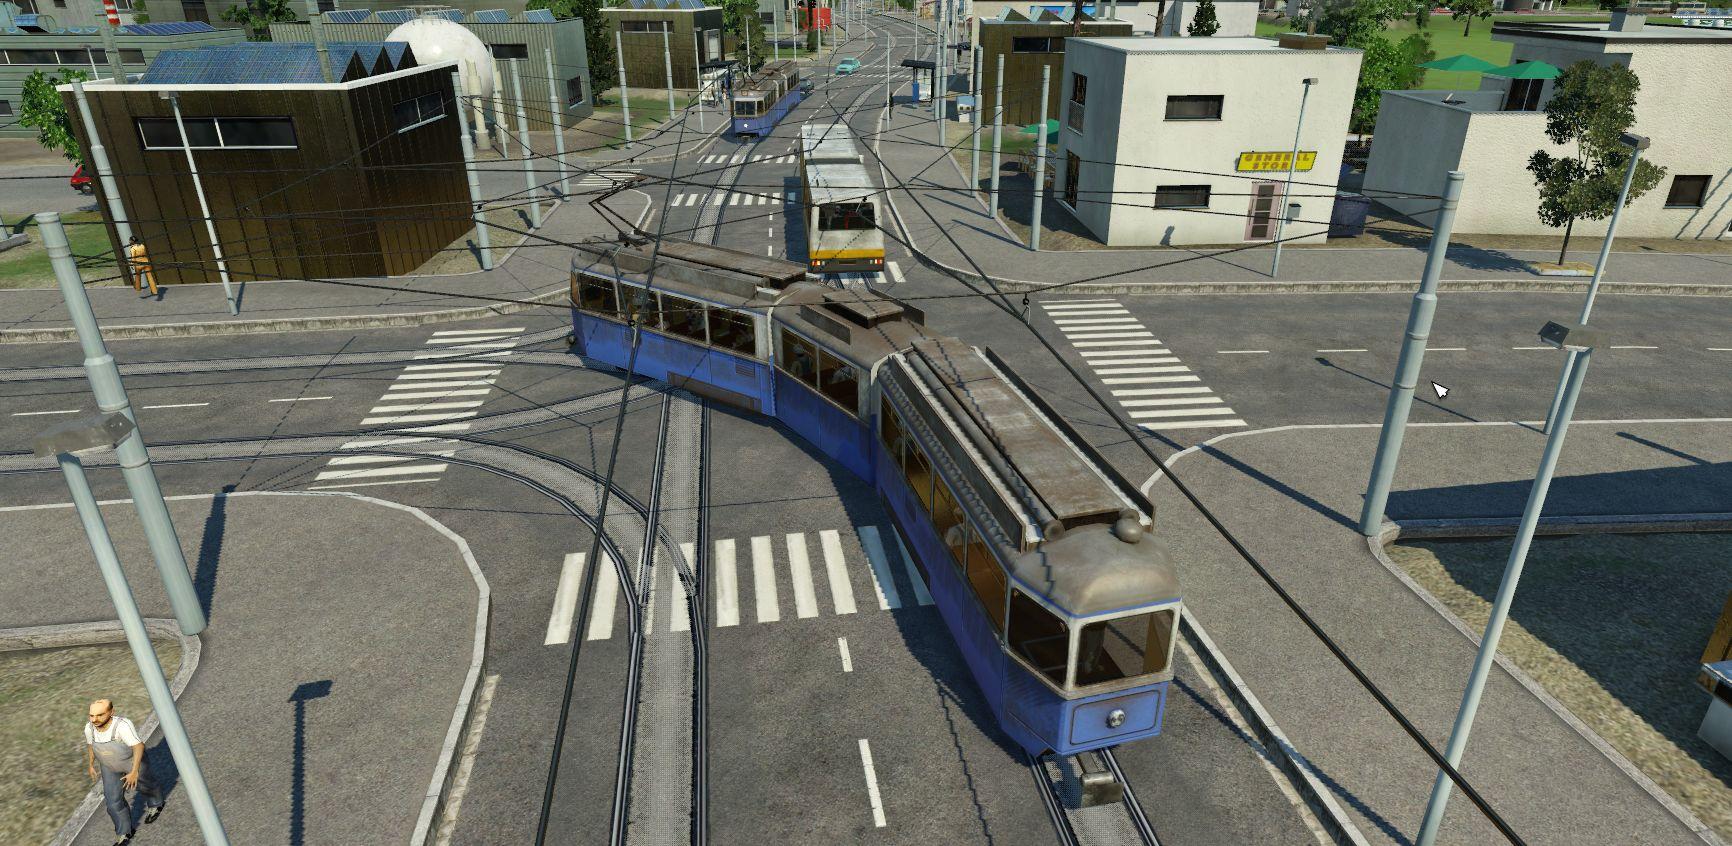 Transport Fever - recenze + průvodce hrou 12846